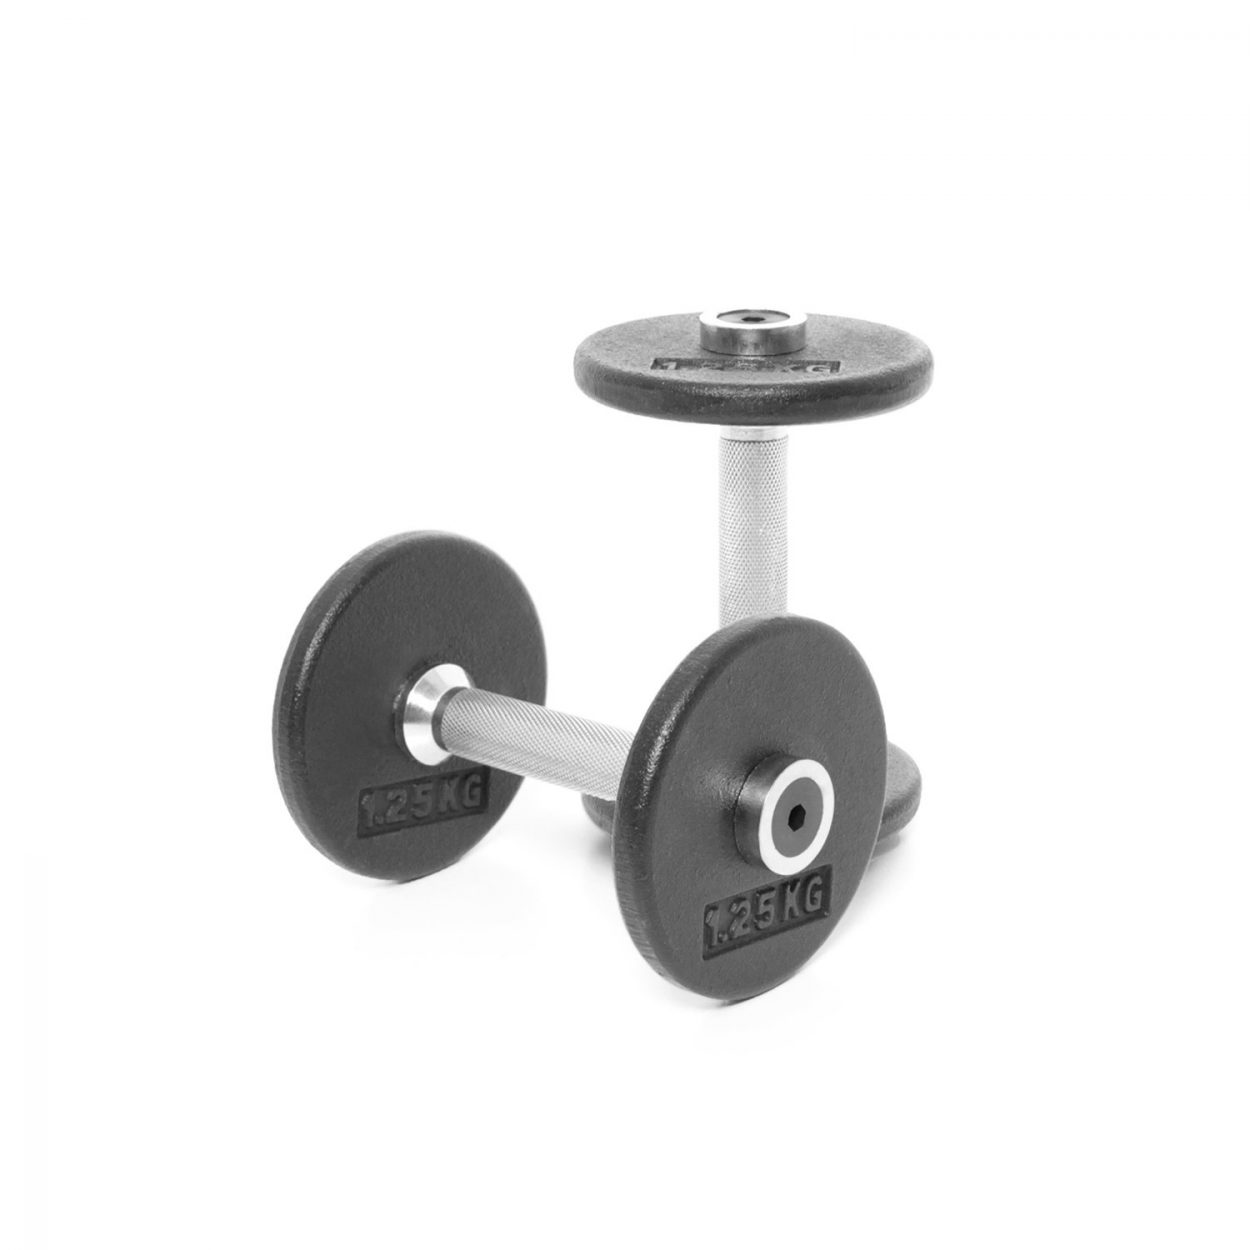 Body Power Pro-style Dumbbells 2.5kg (x2)